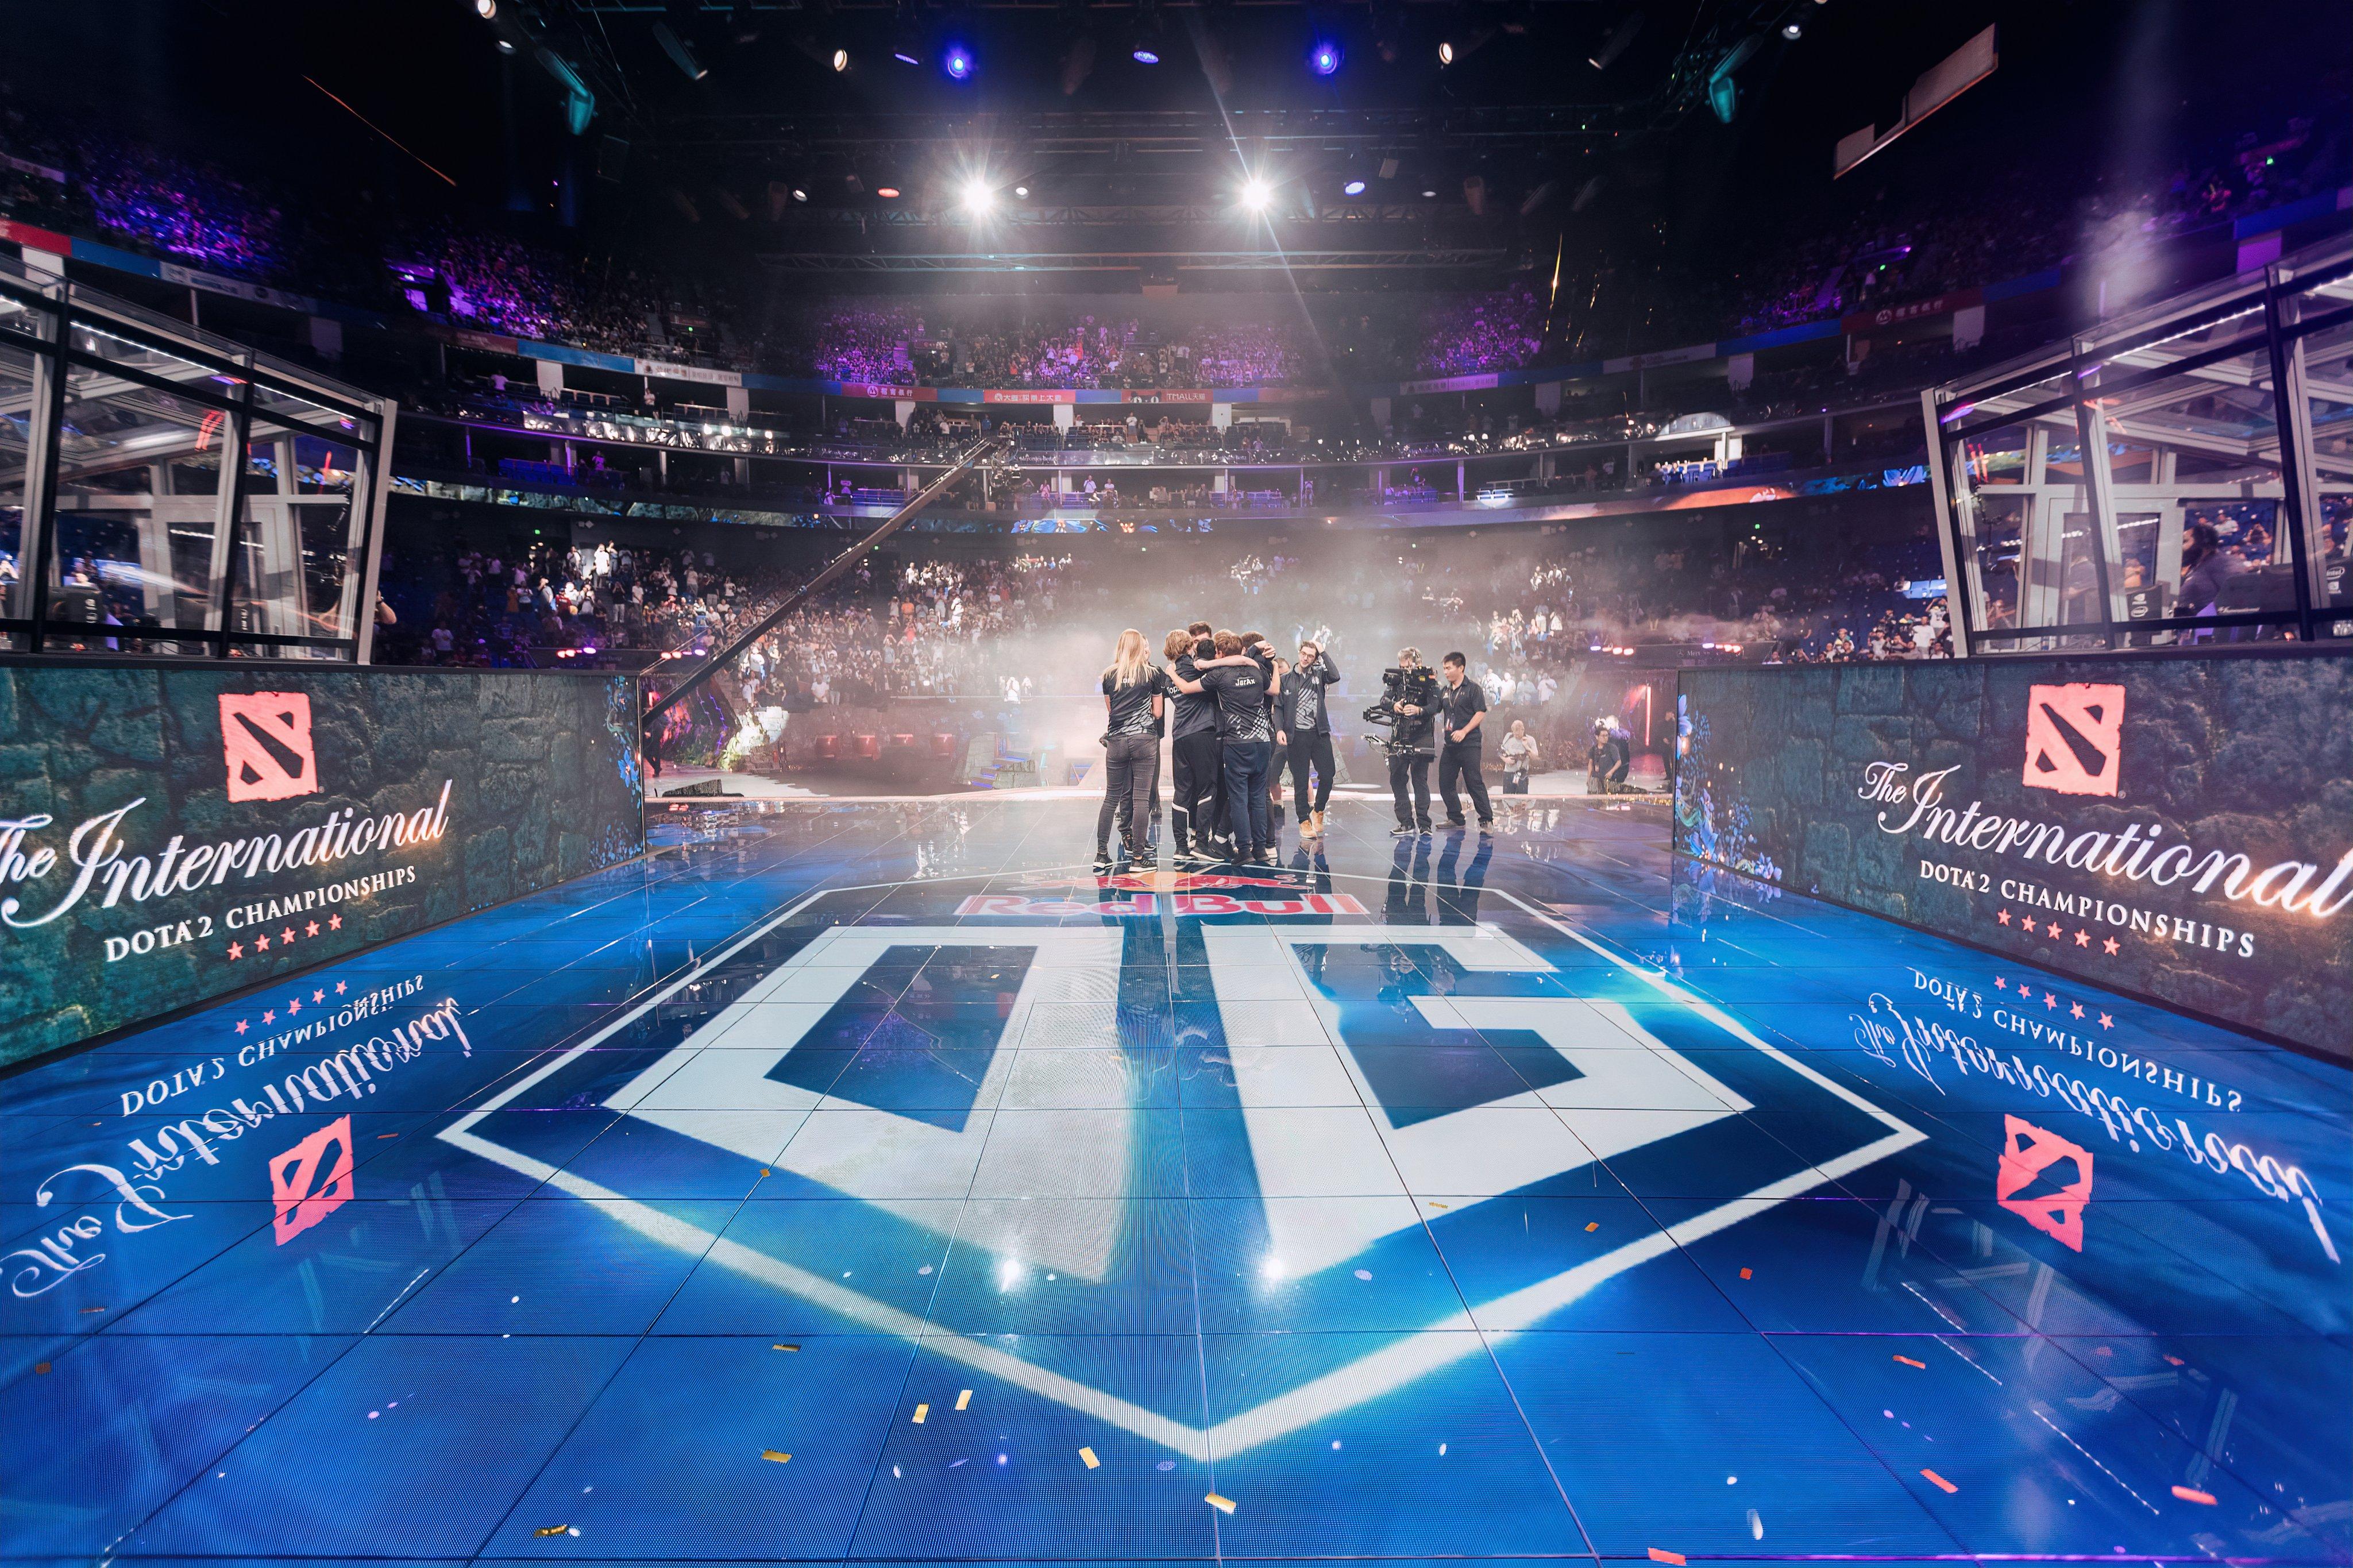 Dota 2. Команда OG победила в Гранд-финале The International 2019 - изображение 2